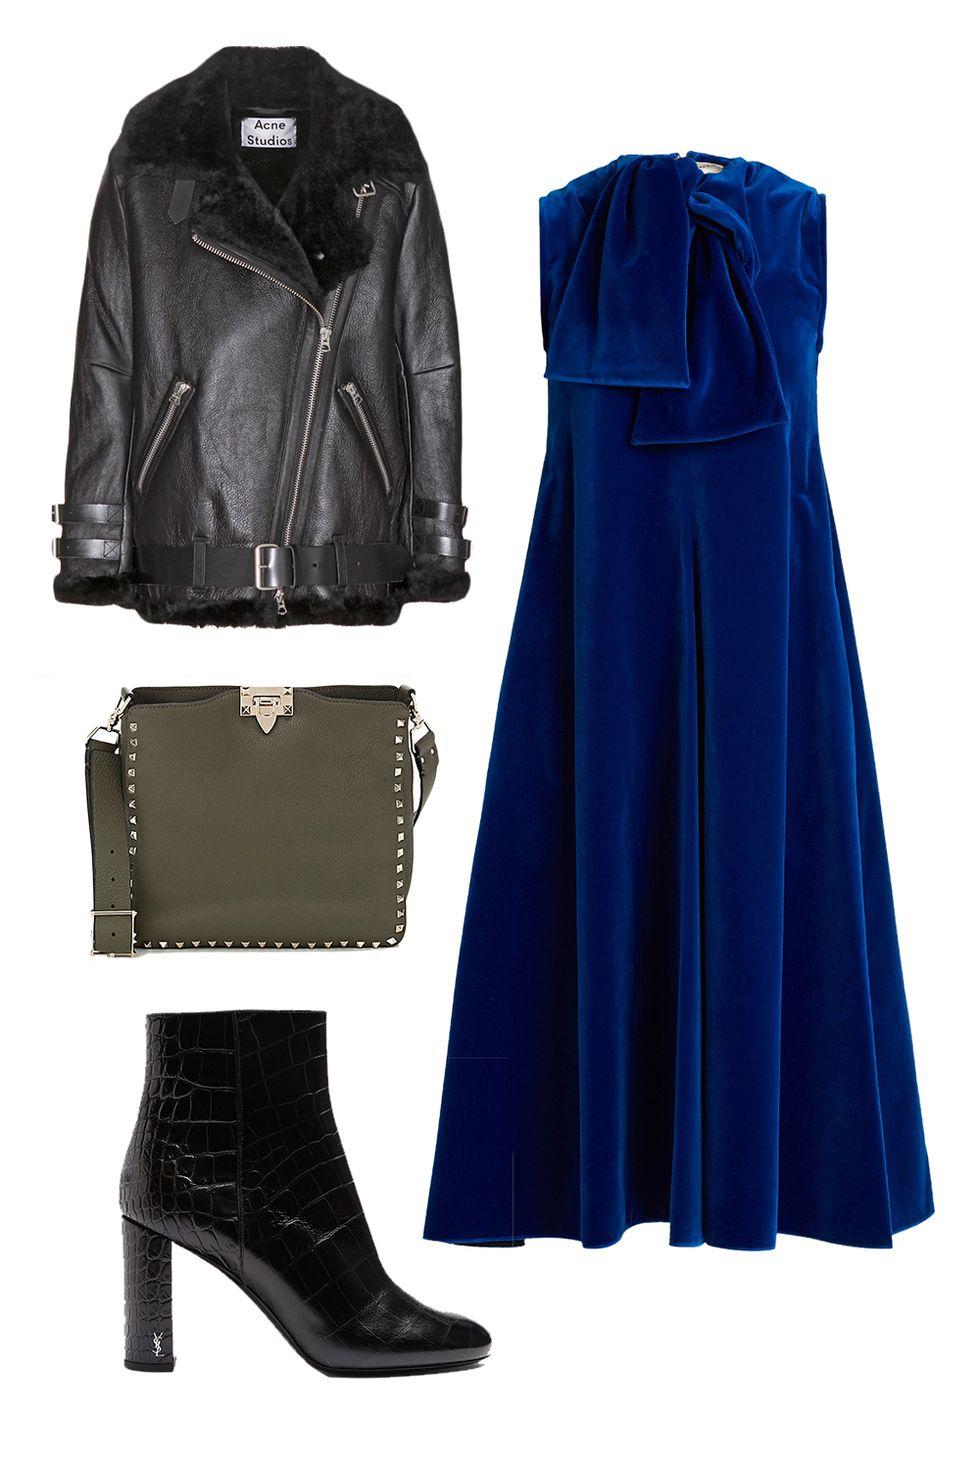 blue-navy-dress-midi-strapless-green-bag-black-jacket-moto-black-shoe-booties-velvet-fall-winter-thanksgiving-outfits-holidays-dinner.jpg